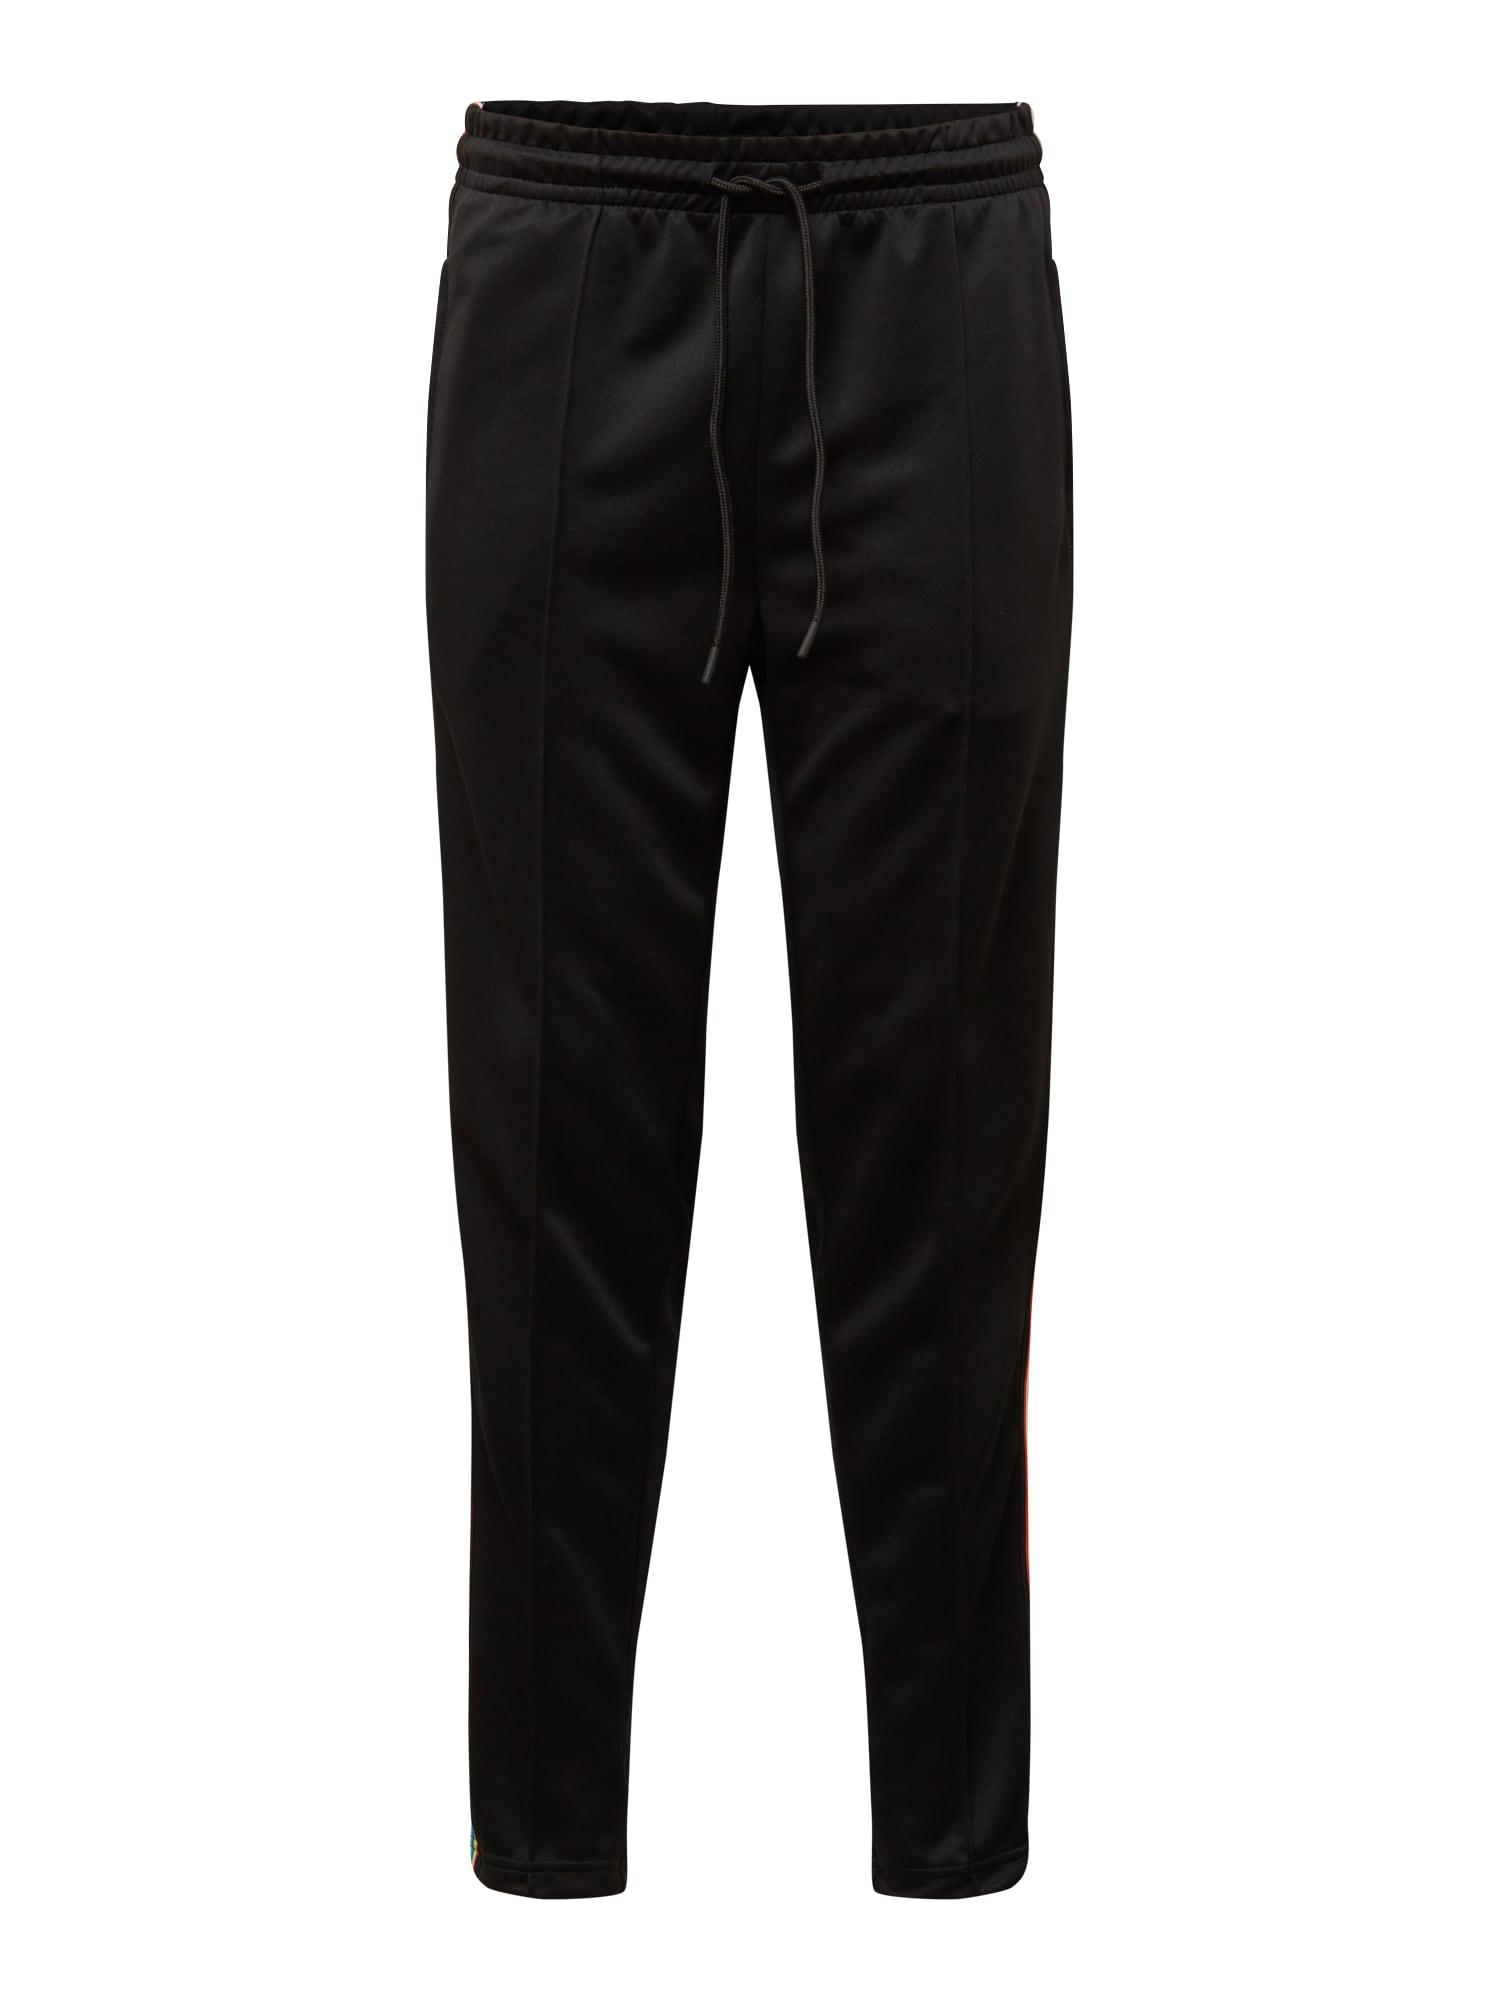 Kalhoty s puky modrá žlutá černá Urban Classics